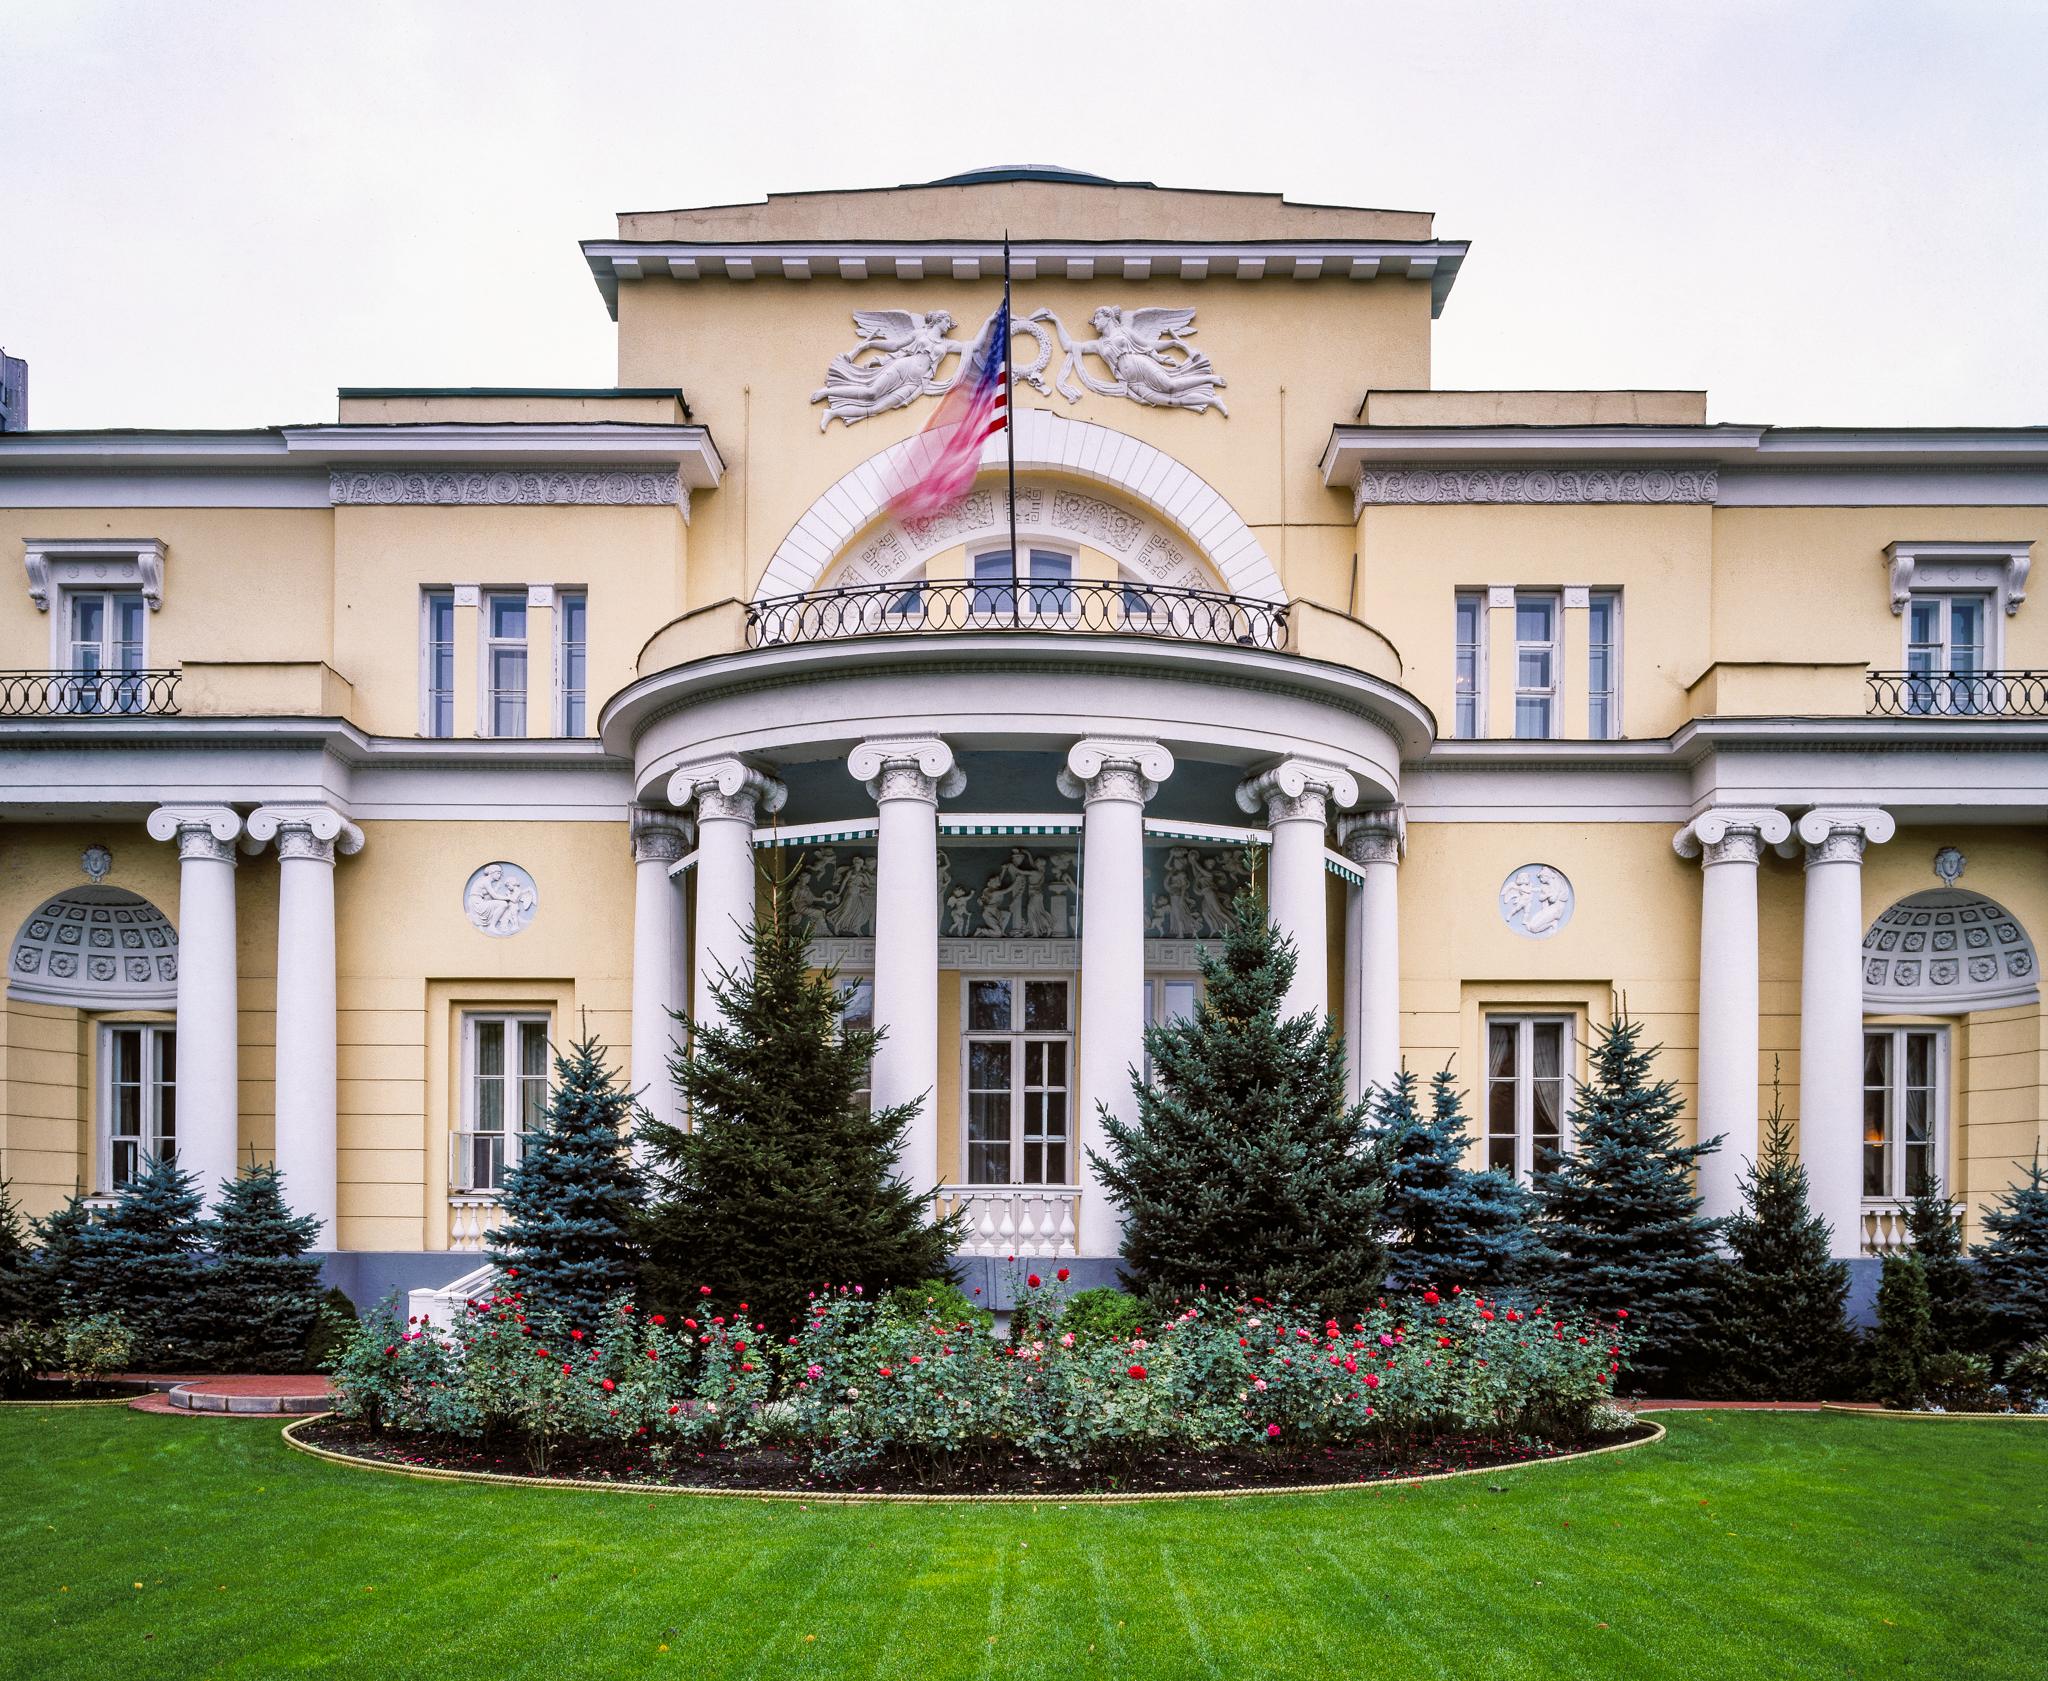 Bangunan kuning dengan kolom dan ukiran (State Dept.)